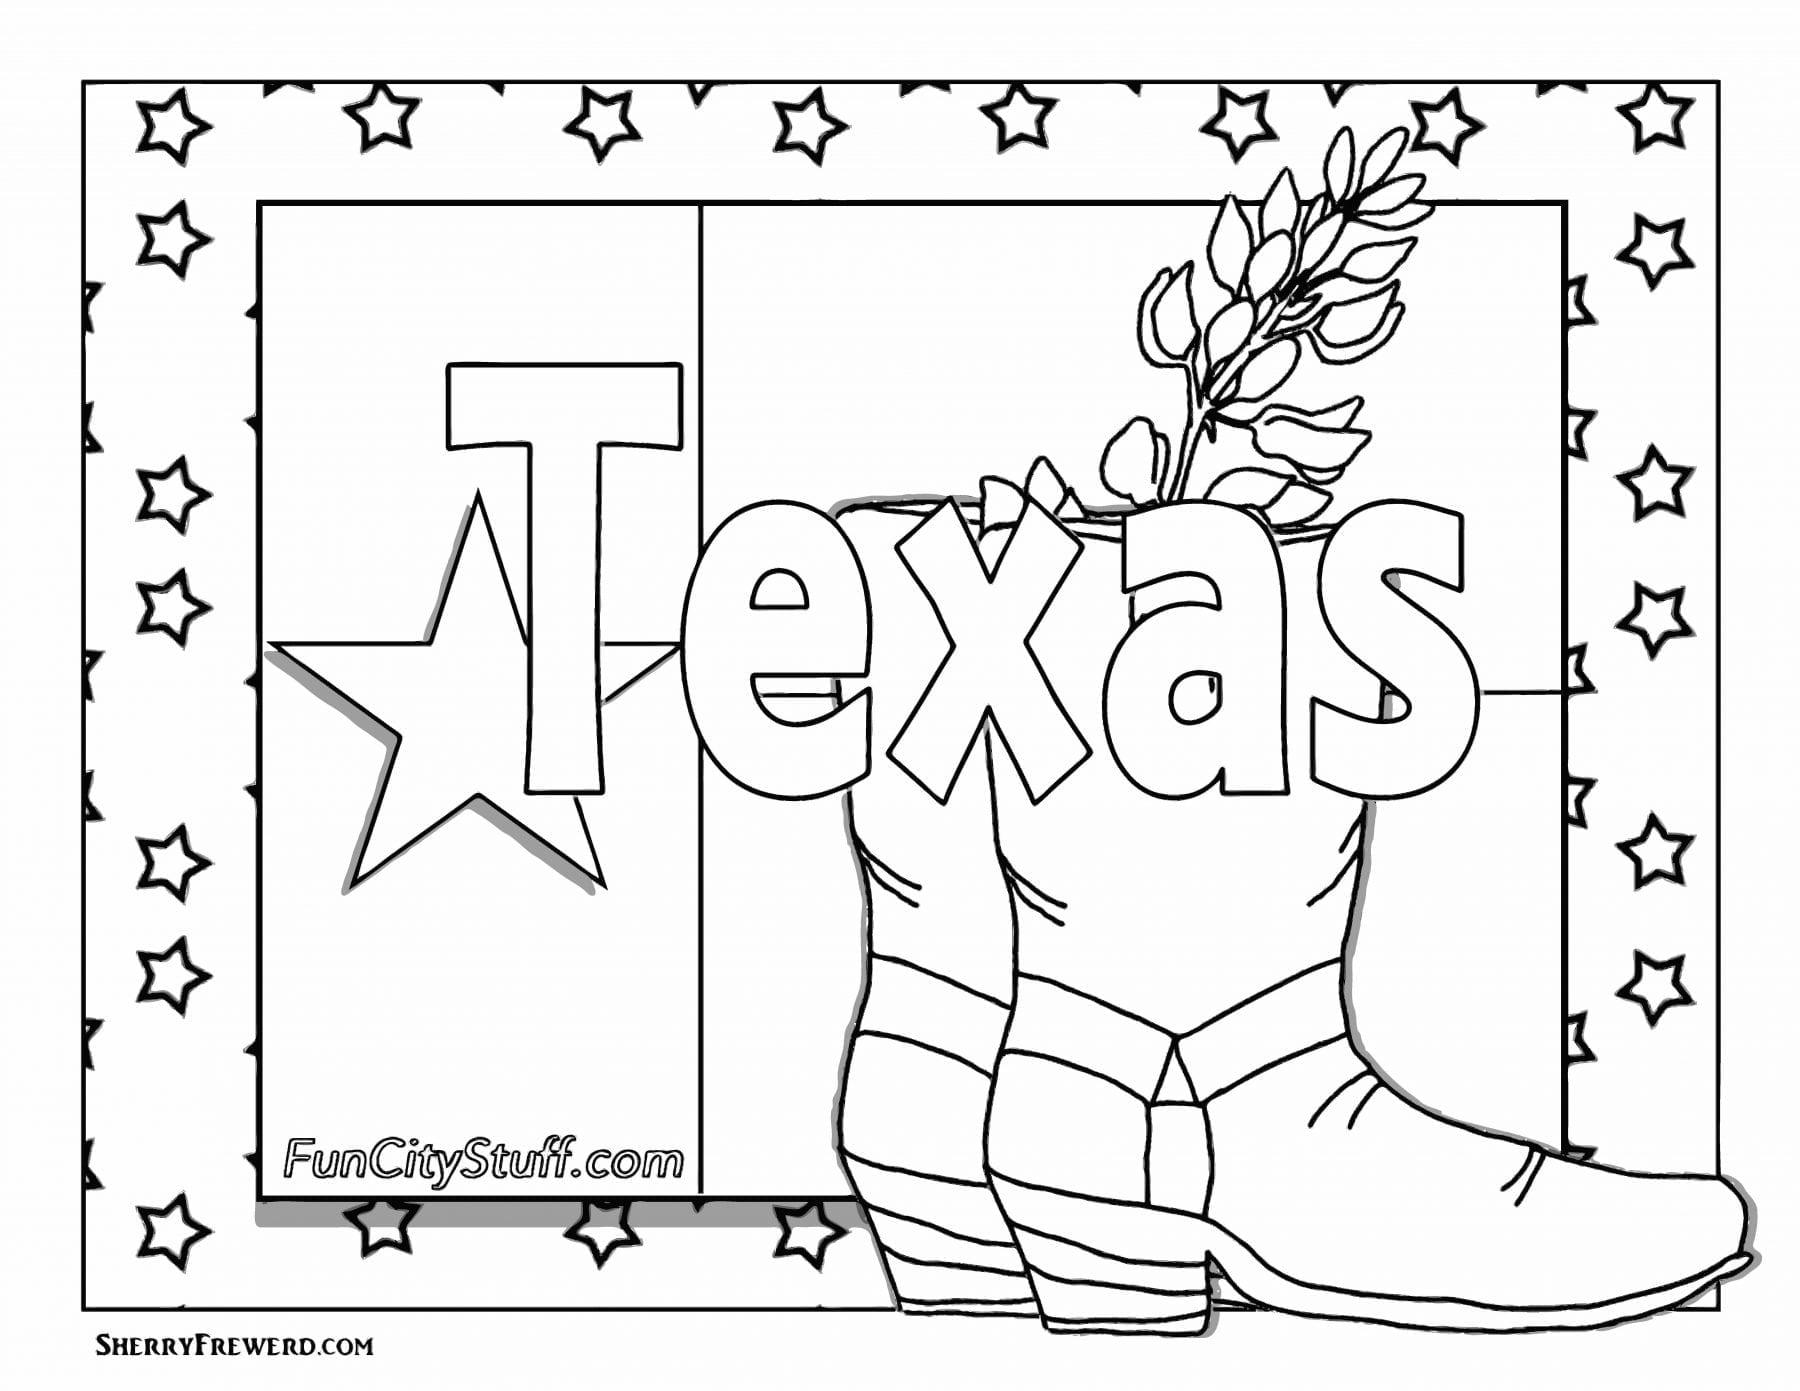 Texas Symbols Coloring Sheets